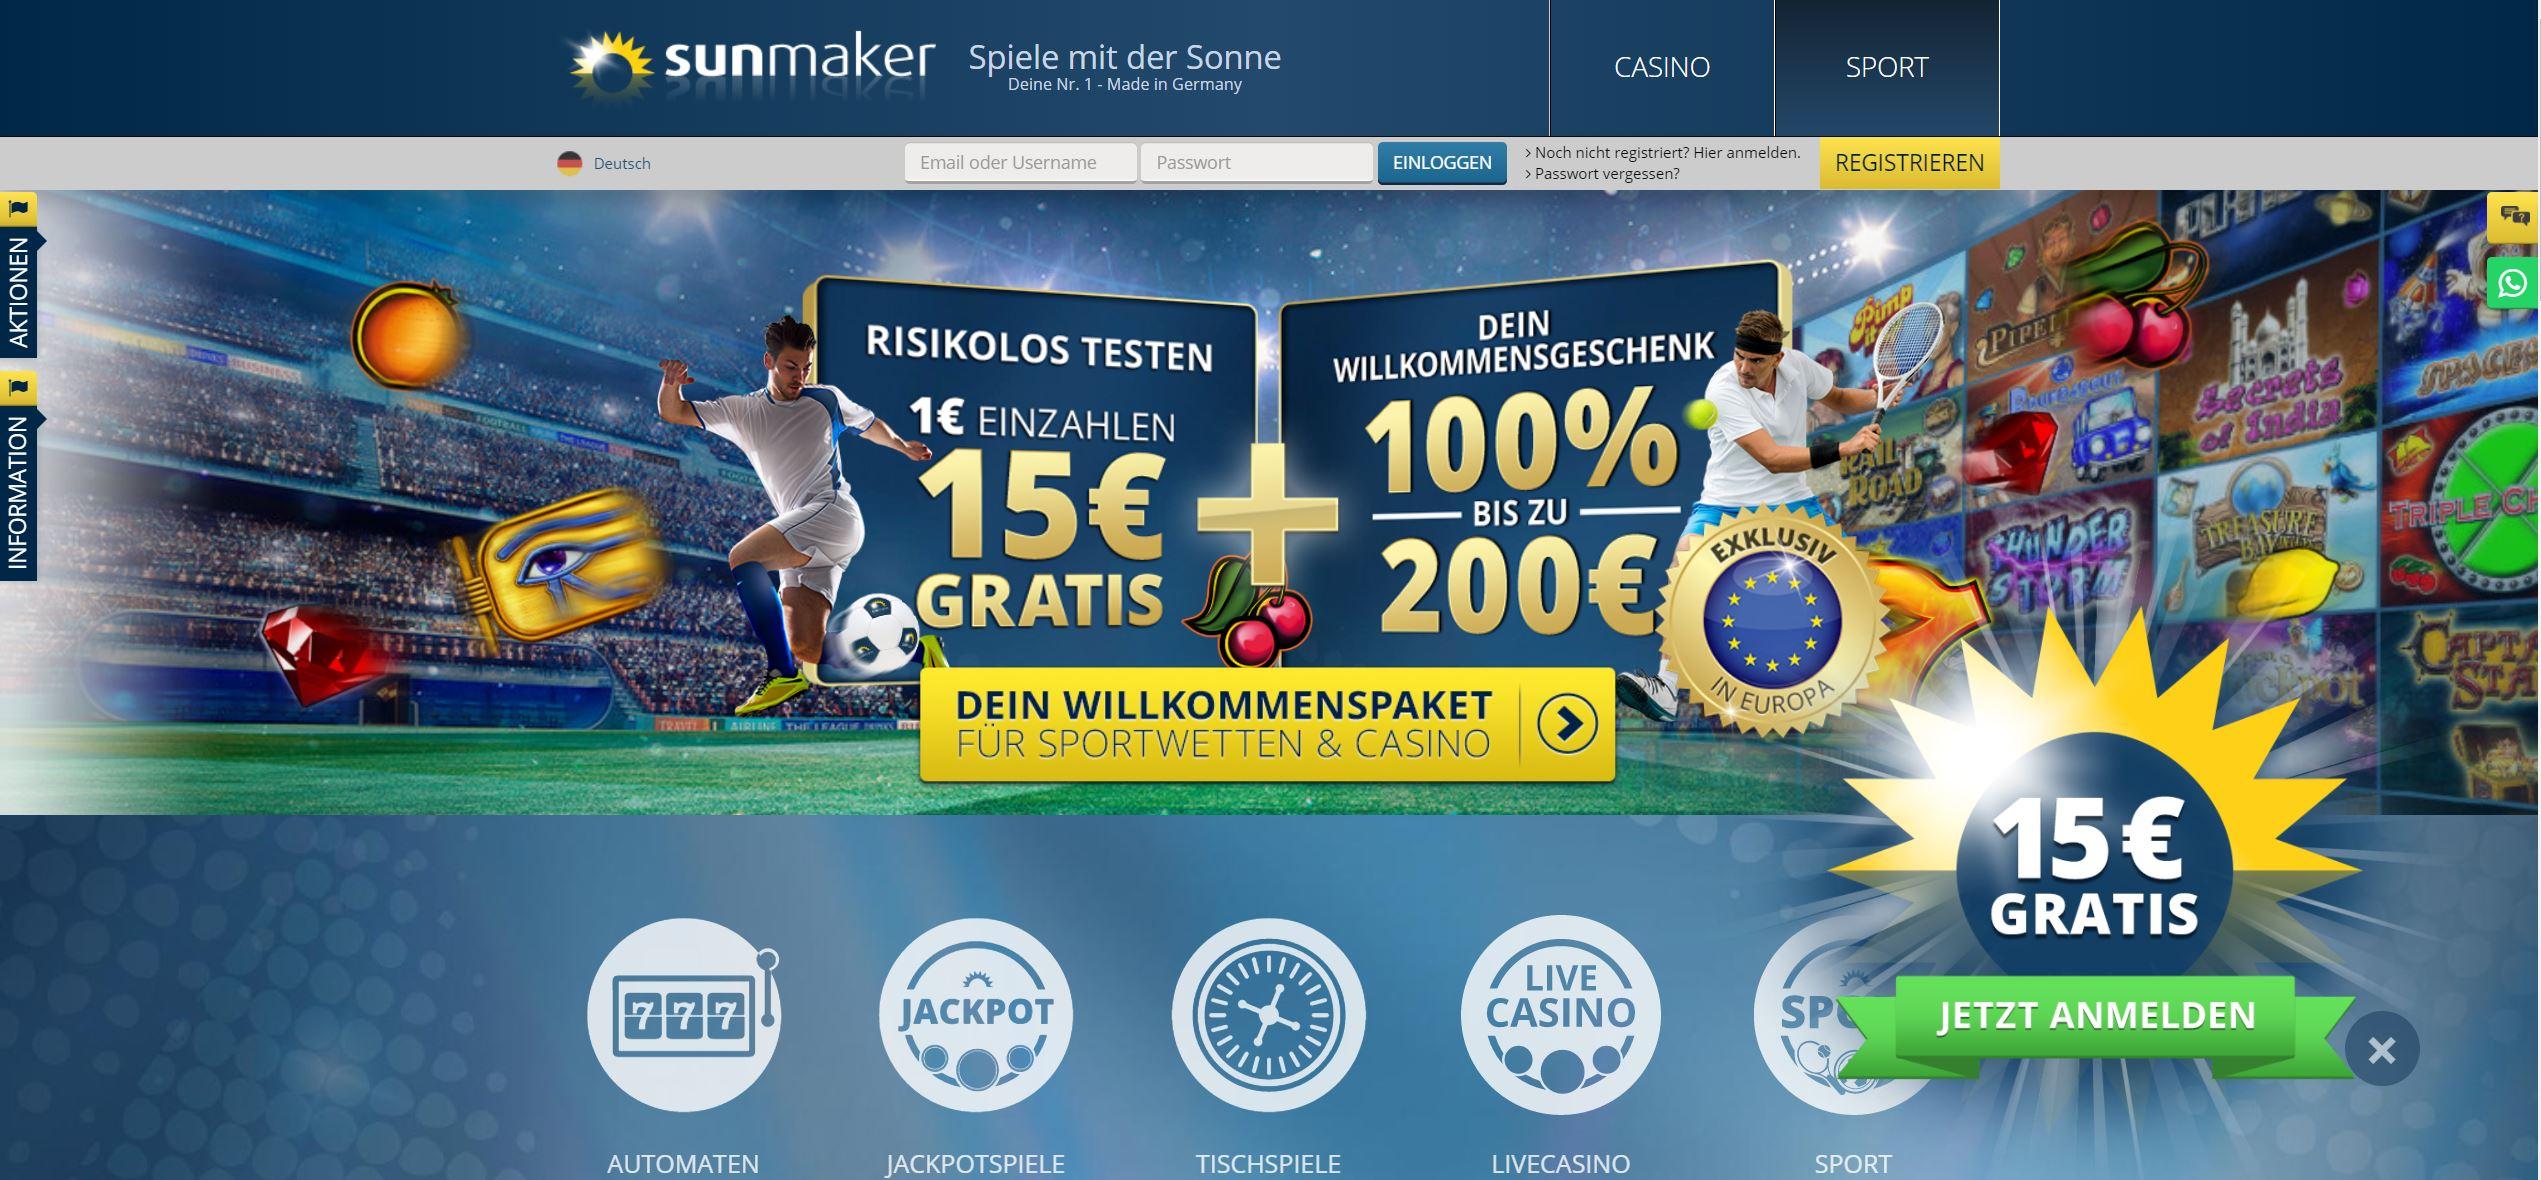 poker online echtgeld paypal